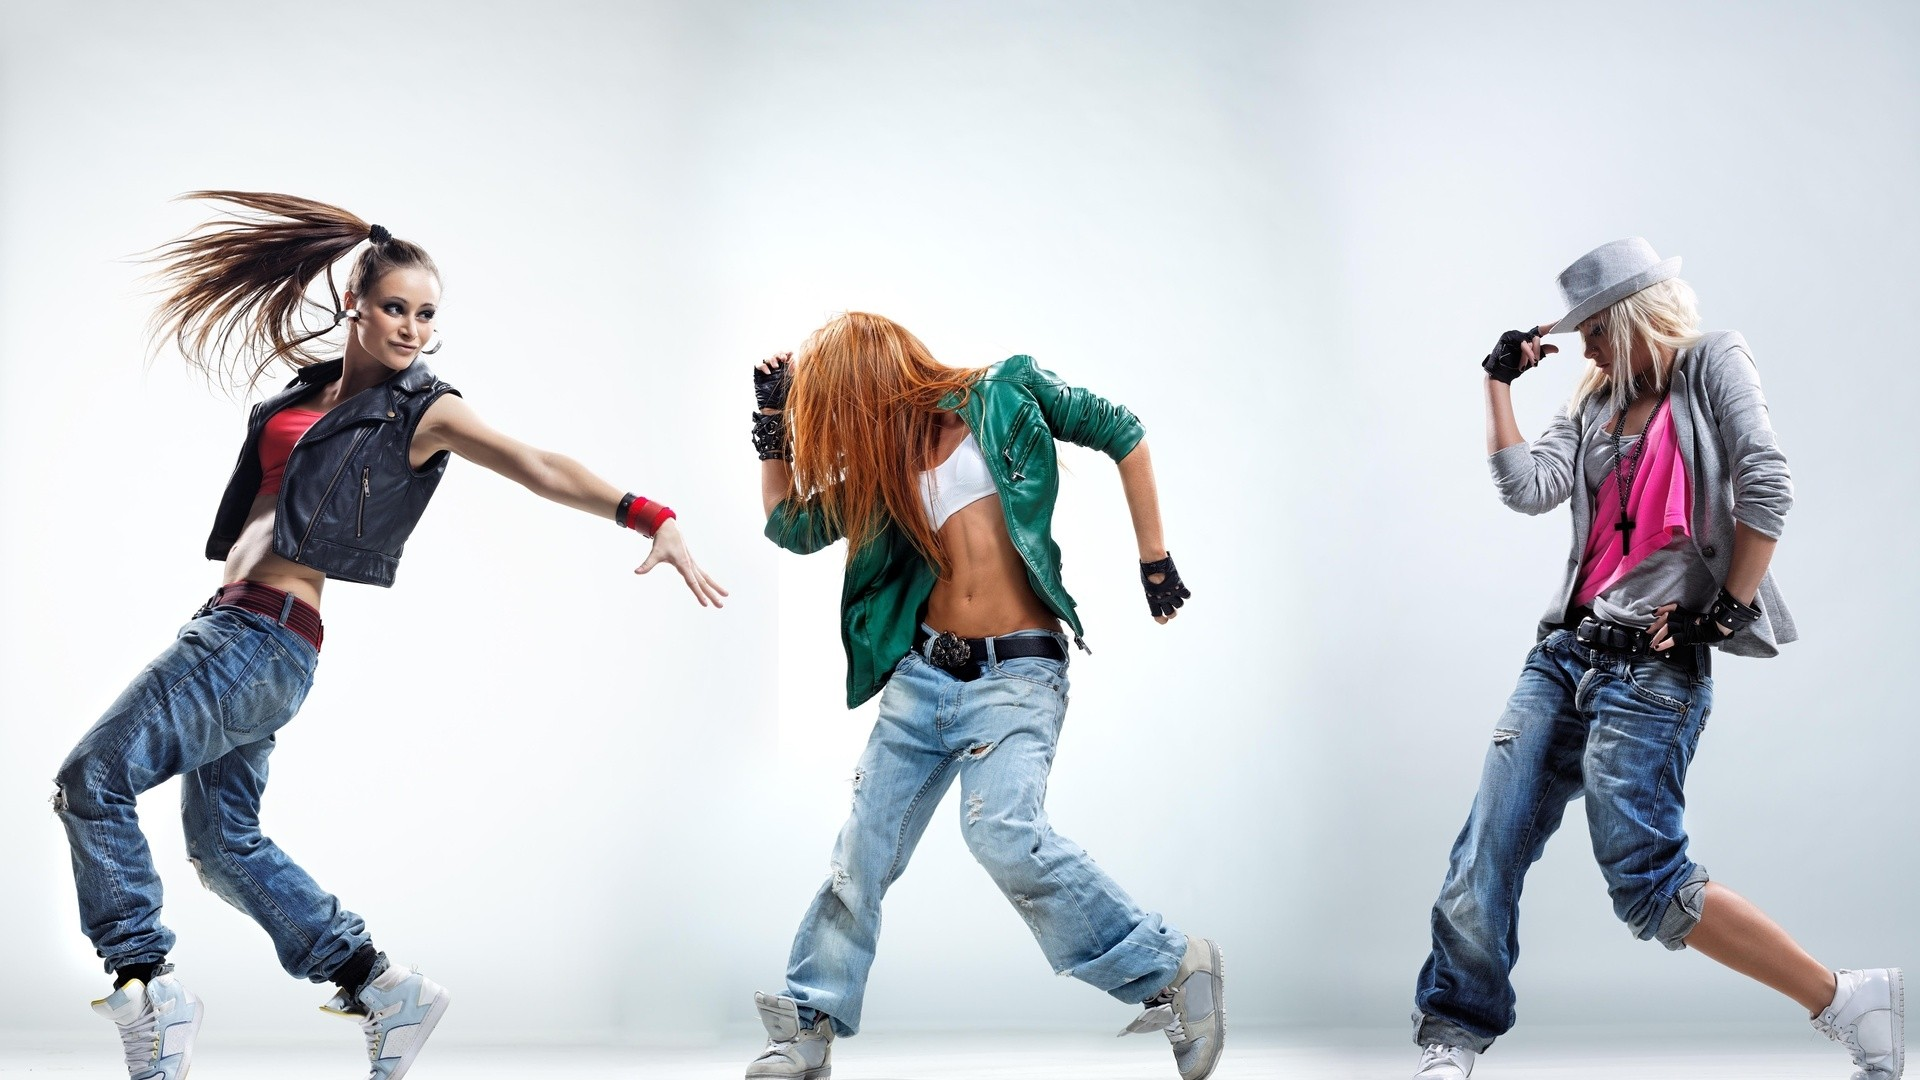 Dance wallpaper photo hd